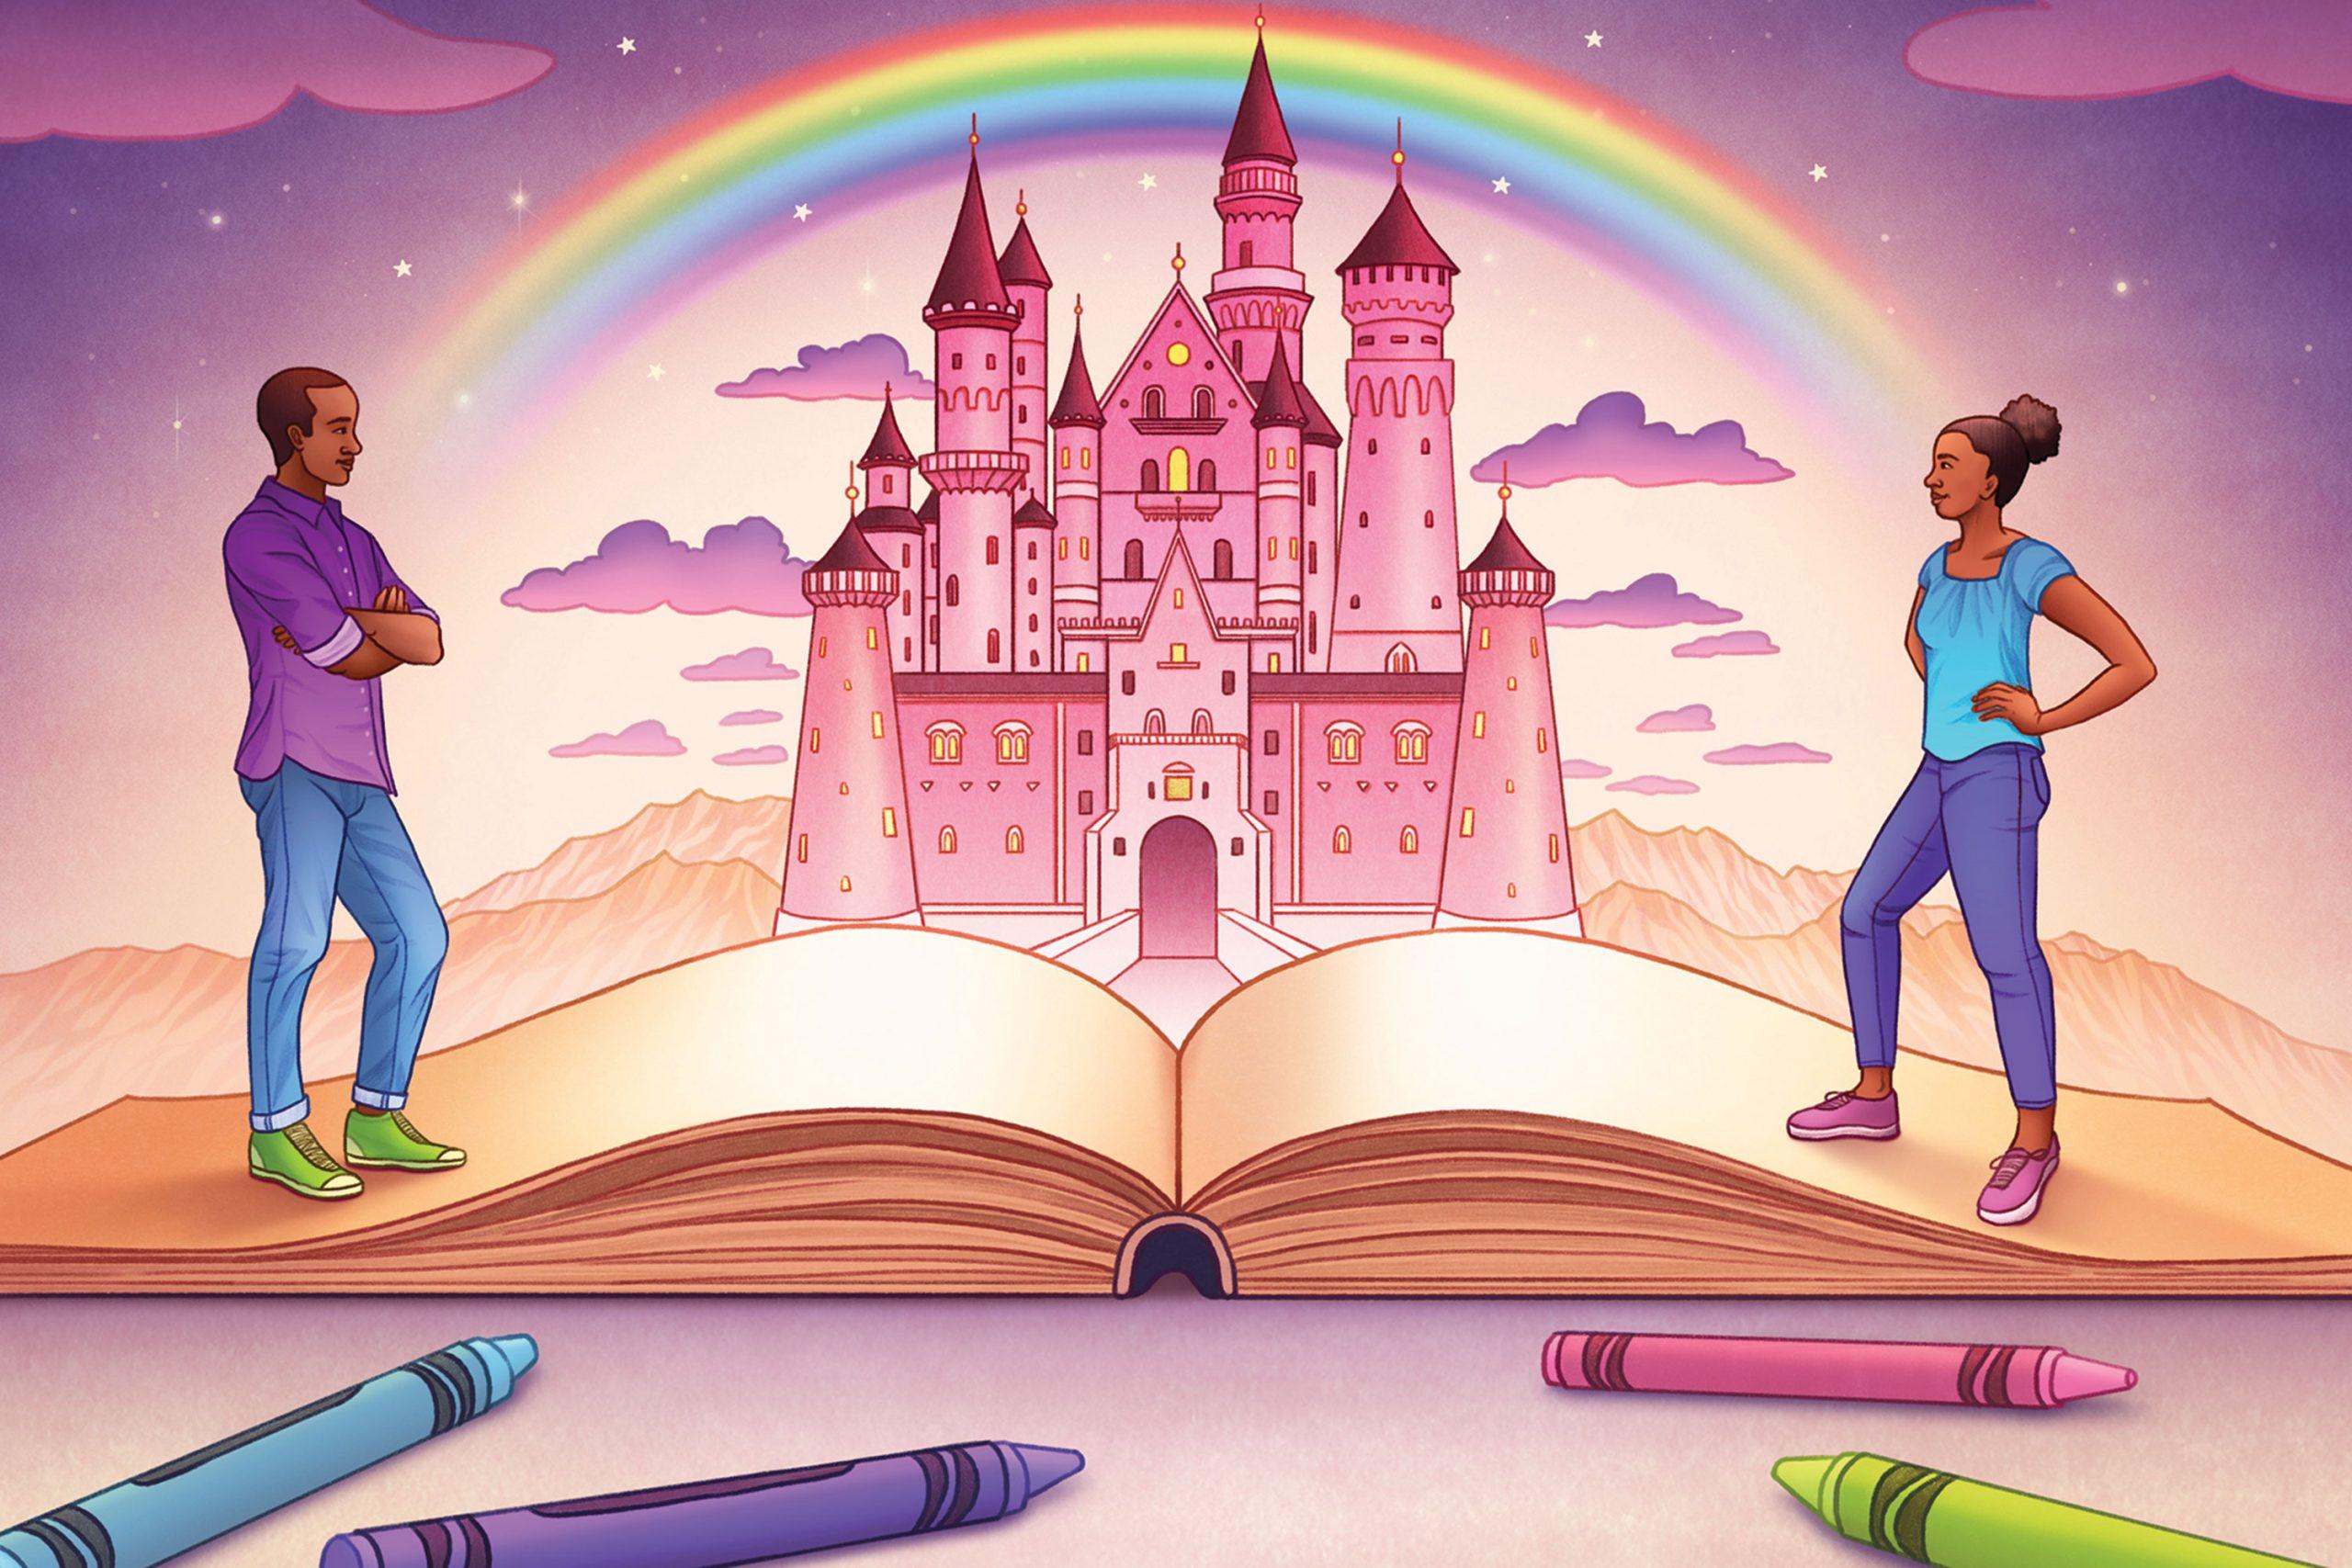 Illustration by Hannah Agosta